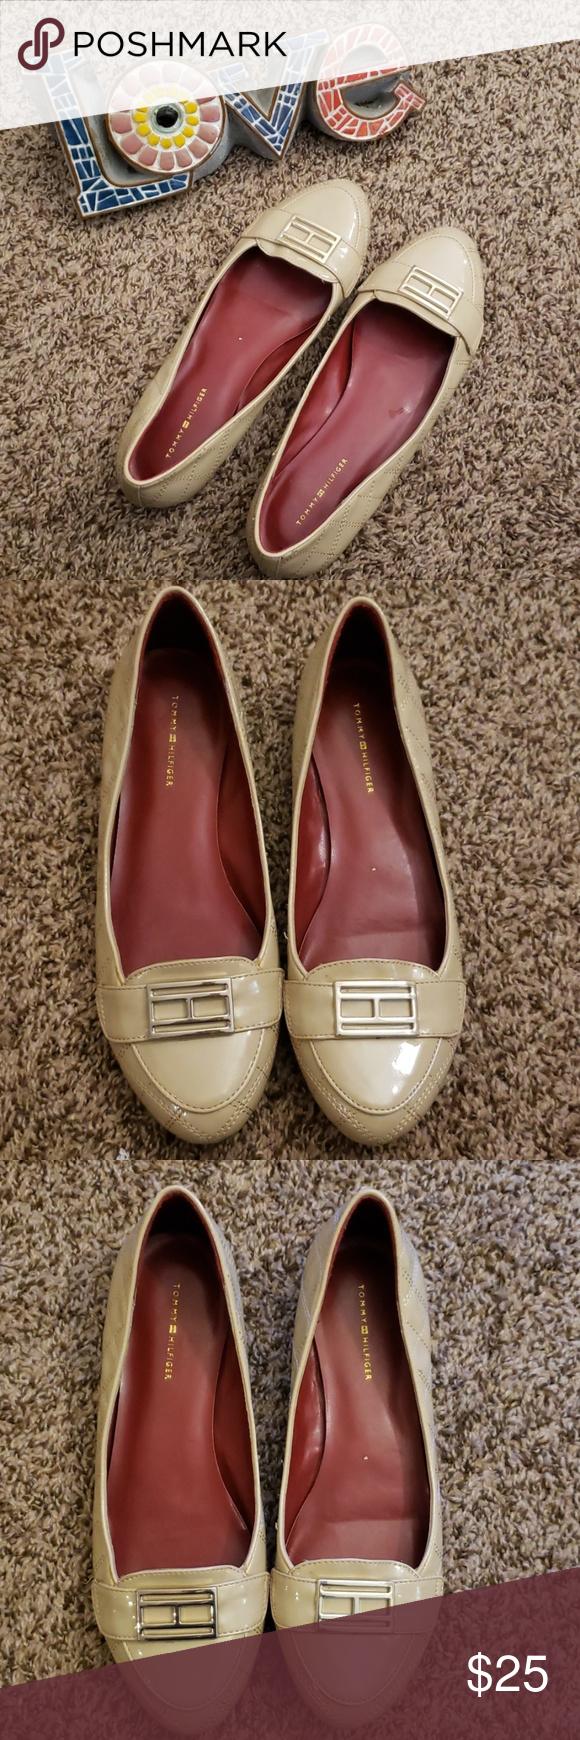 Tommy Hilfiger Women S Flat Shoes Patent Leather Tommy Hilfiger Katya Patent Leather Flats Shoes Tommy H Tommy Hilfiger Shoes Tommy Hilfiger Women Patent Shoes